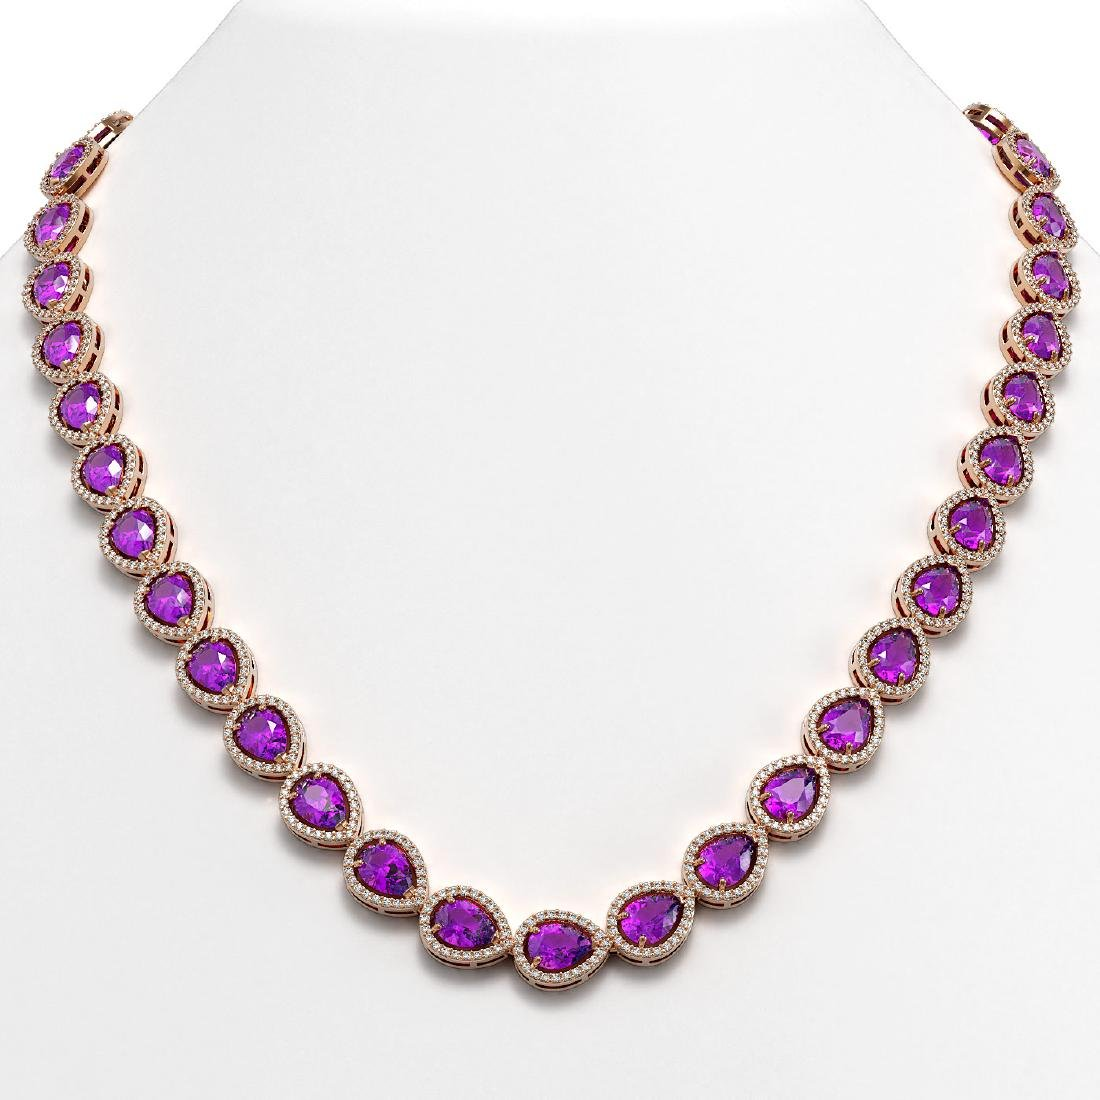 35.13 CTW Amethyst & Diamond Halo Necklace 10K Rose